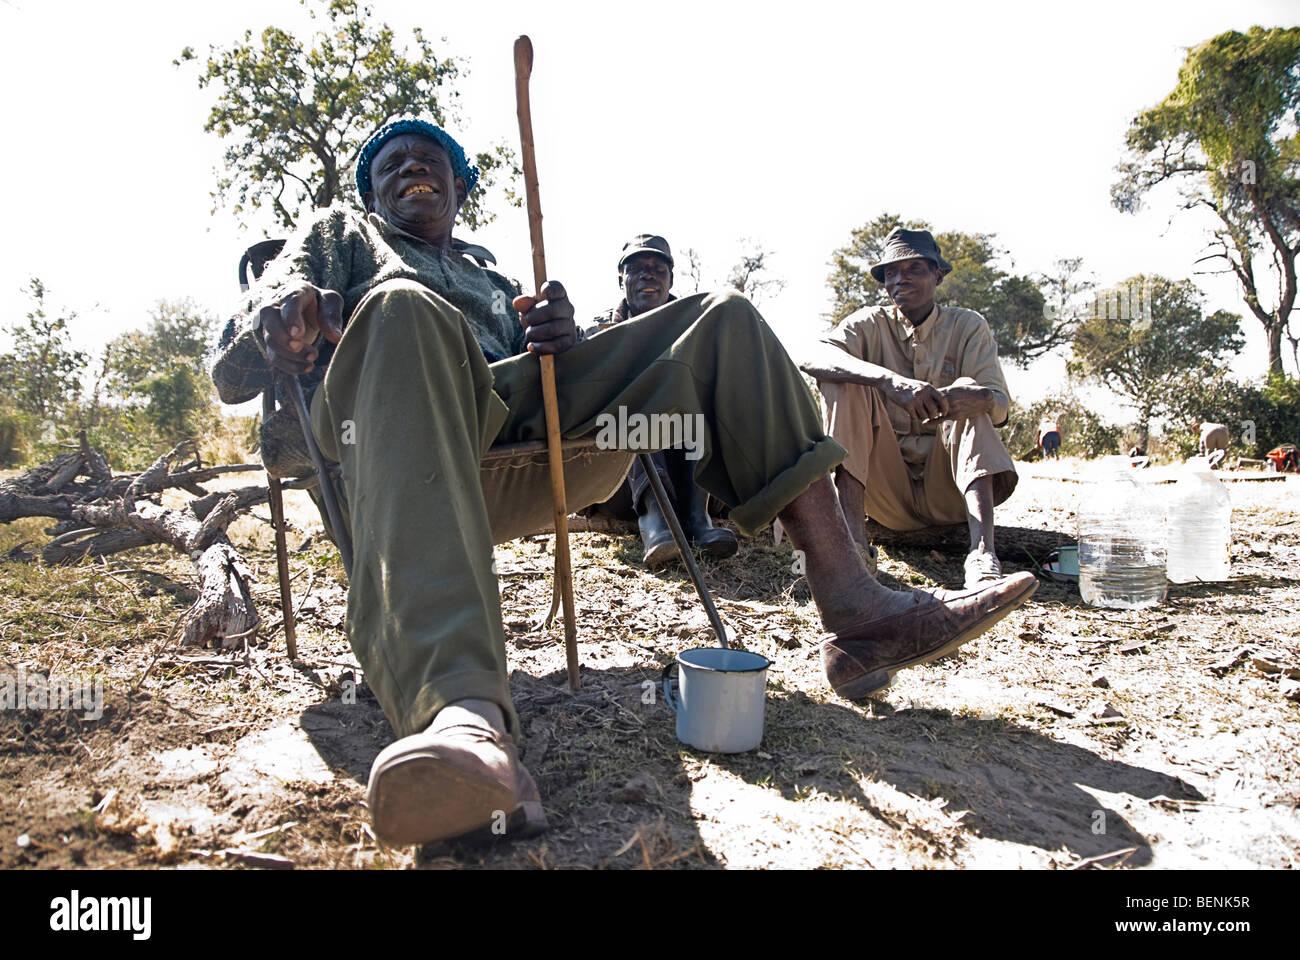 Old men sitting near the fire at their campsite, Okavango delta, Botswana, Africa. - Stock Image